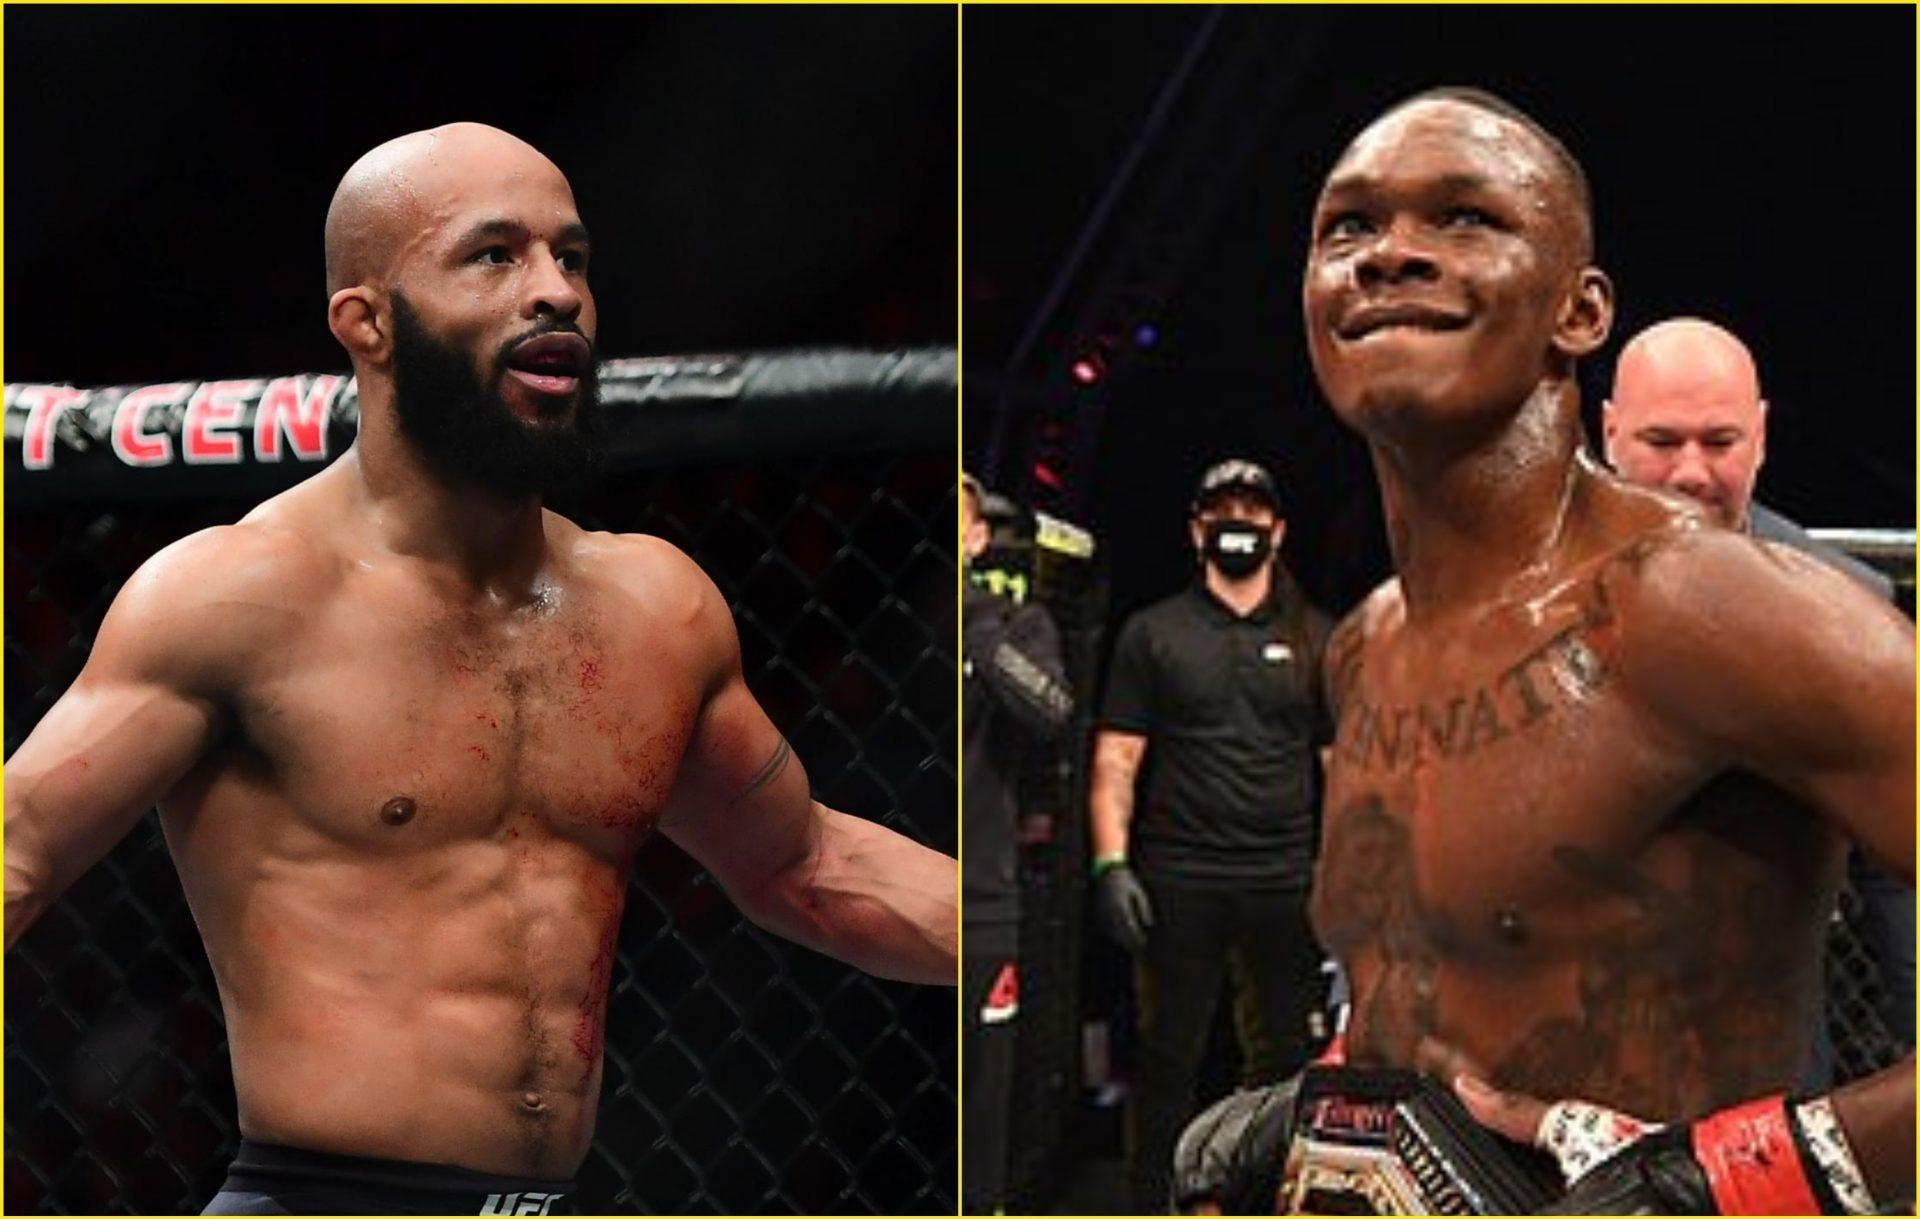 Israel Adesanya says Demetrious Johnson is the ultimate 'MMA GOAT' - Adesanya